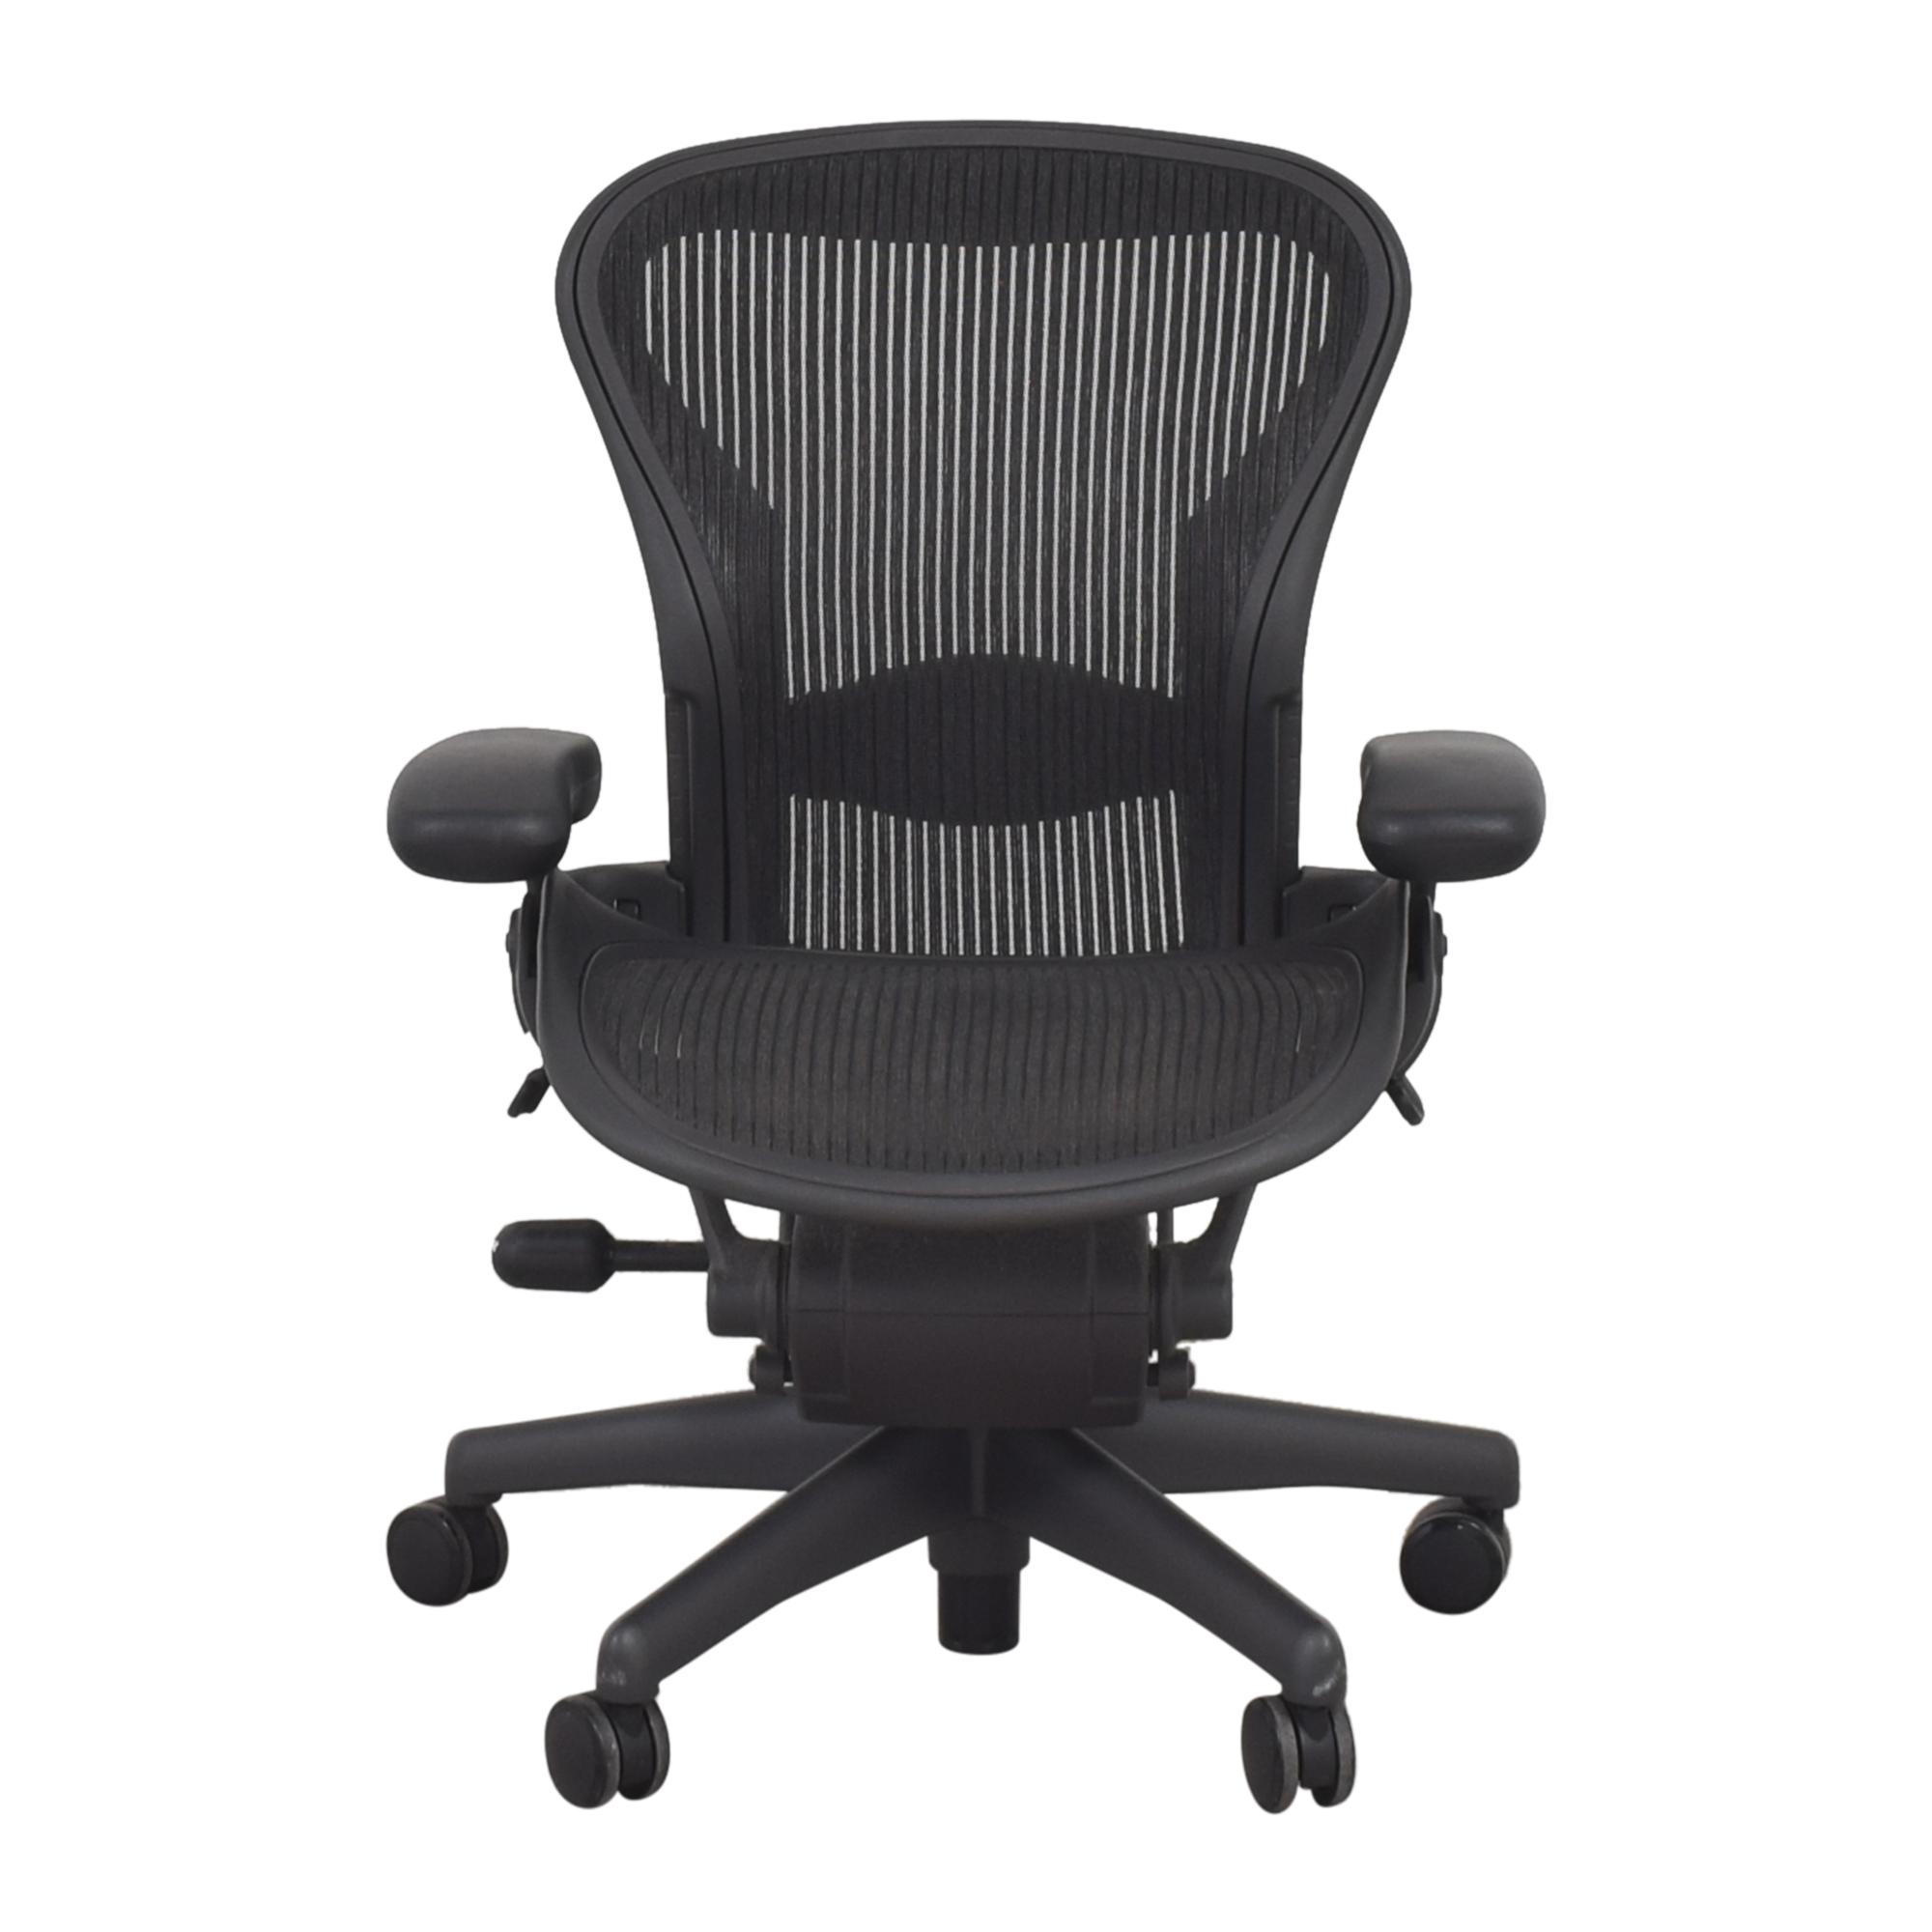 Herman Miller Herman Miller Size A Aeron Chair dimensions